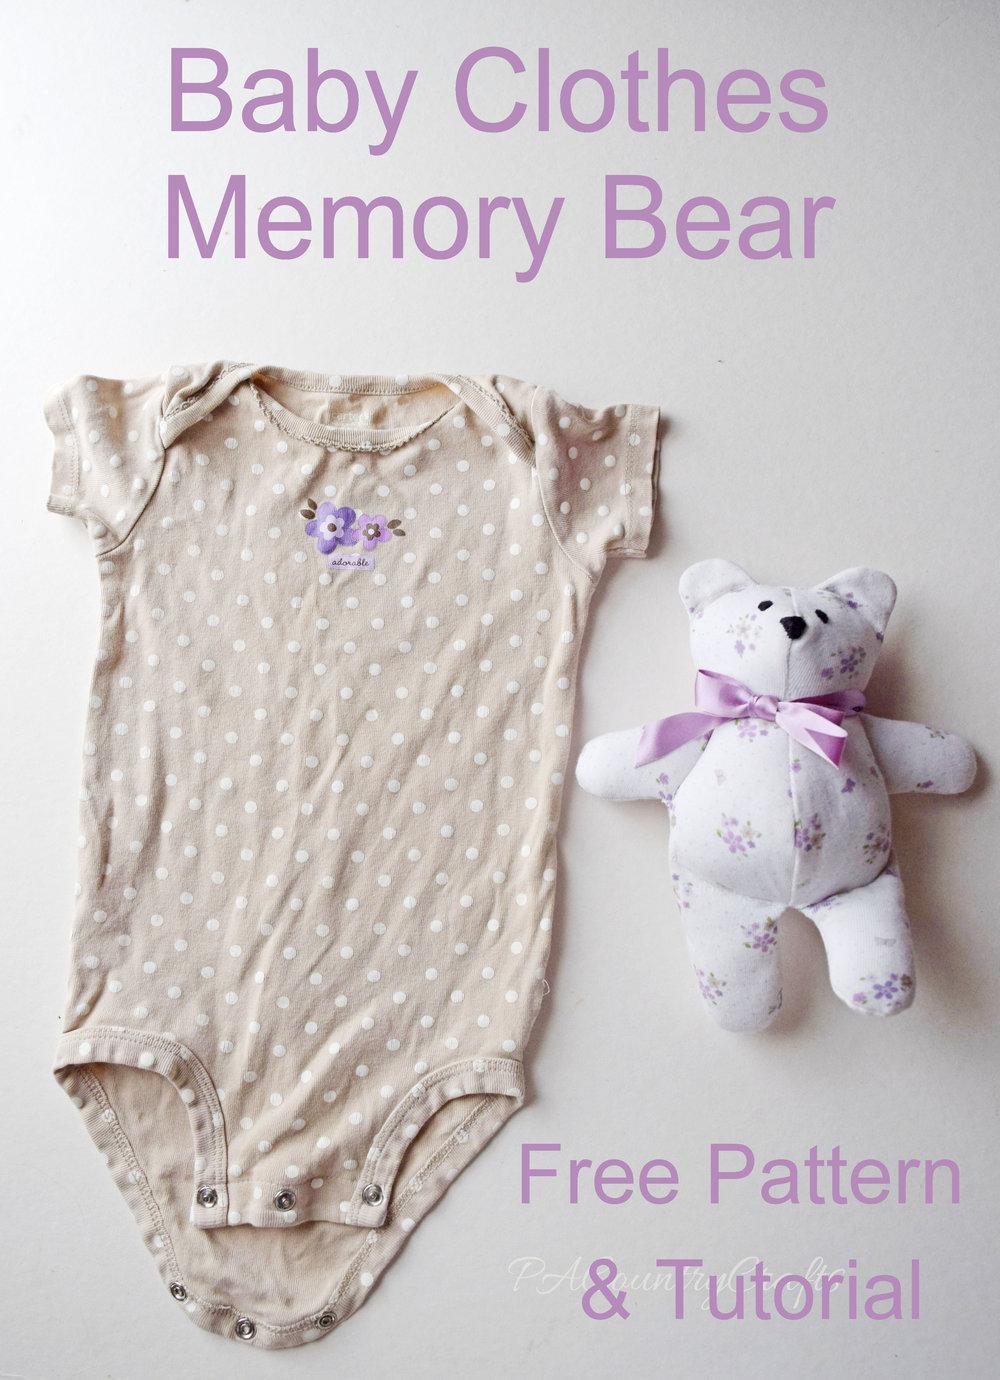 memory-bear-pin-pic-1.jpg